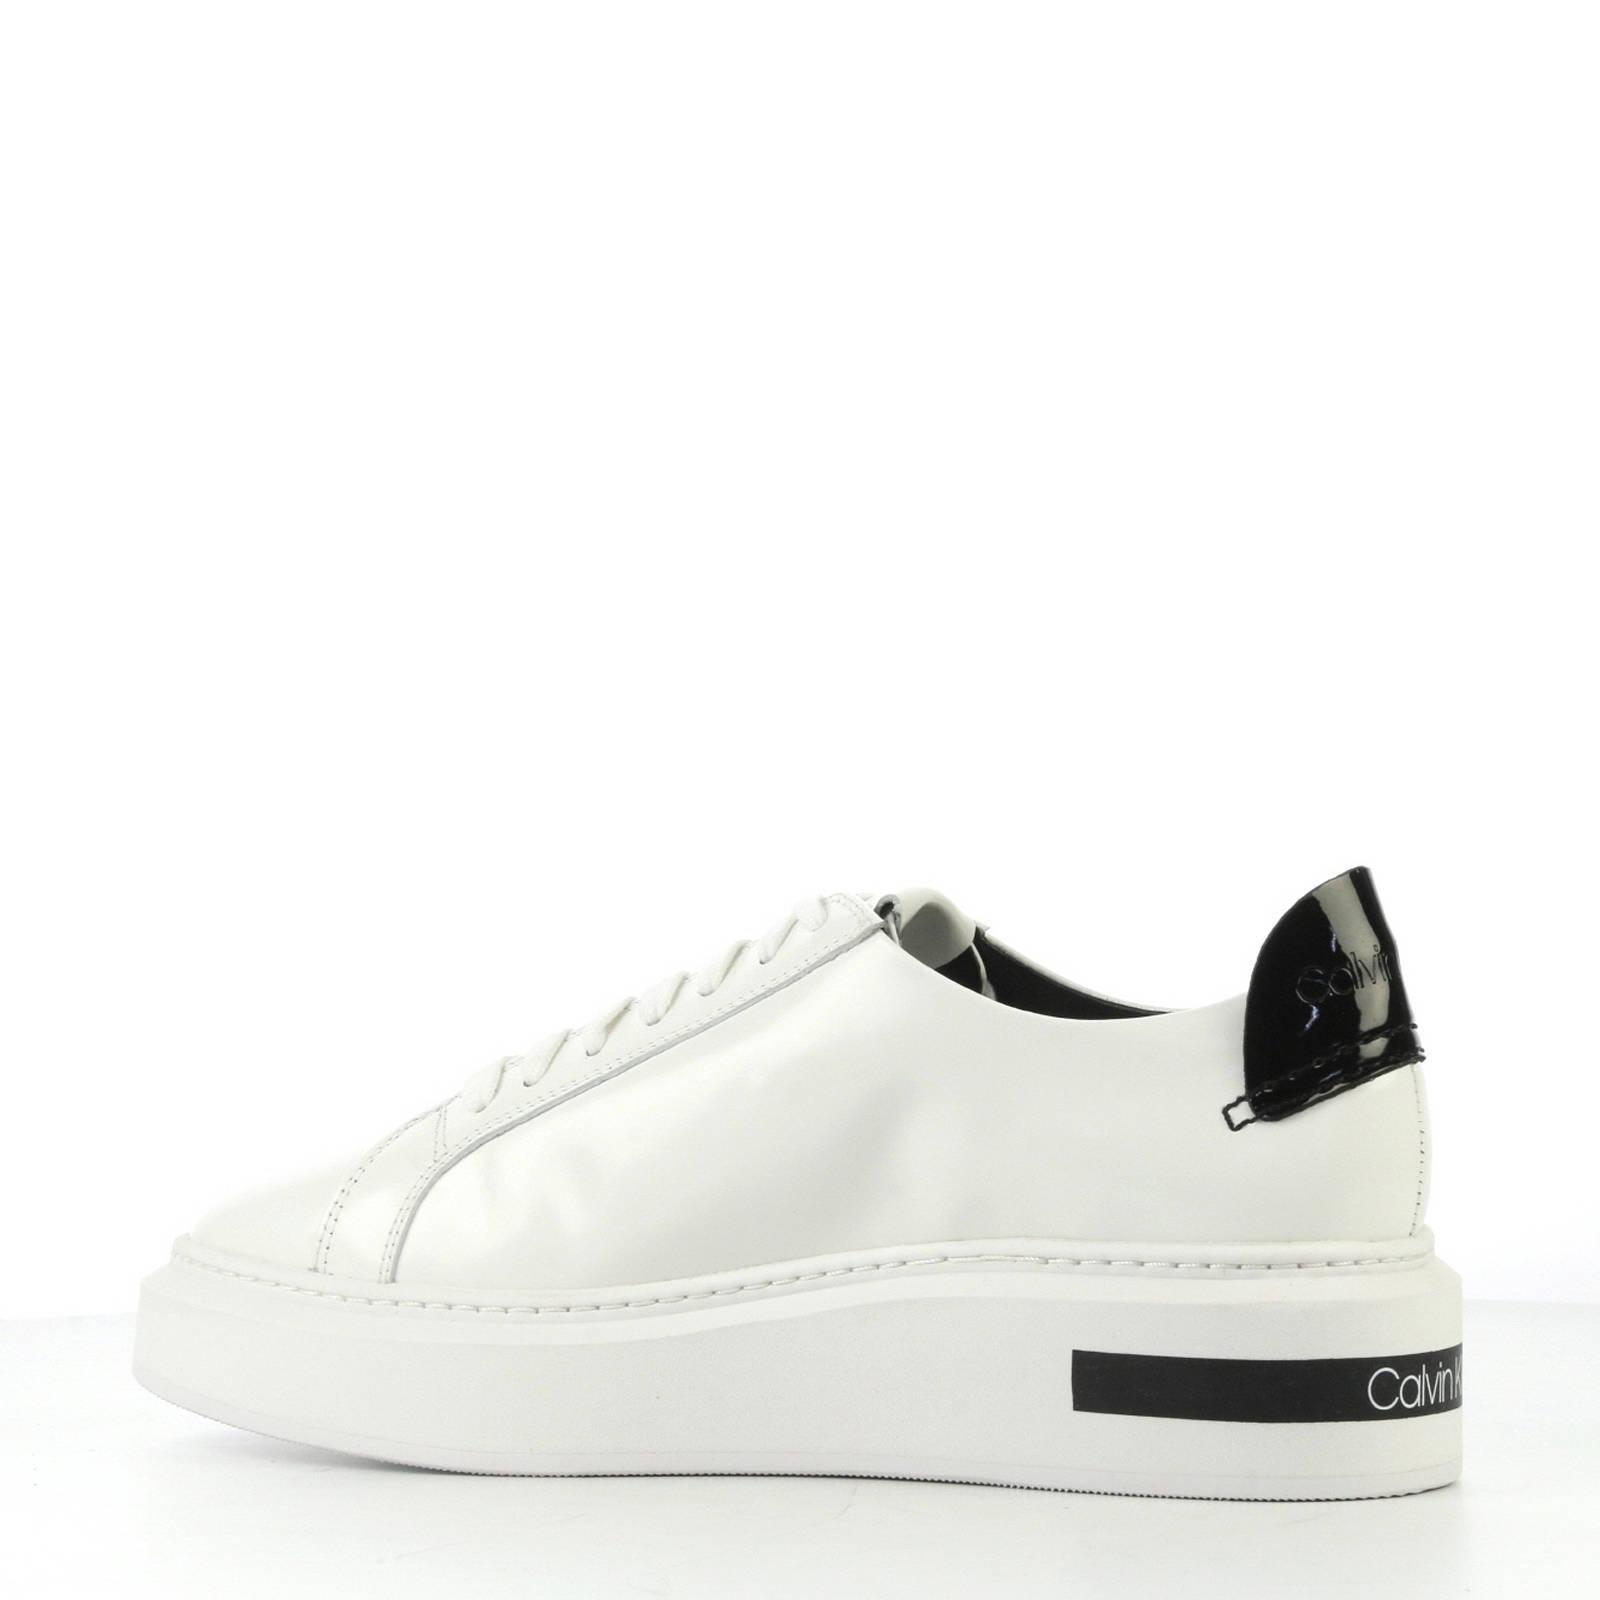 calvin klein tesir sneaker Shop